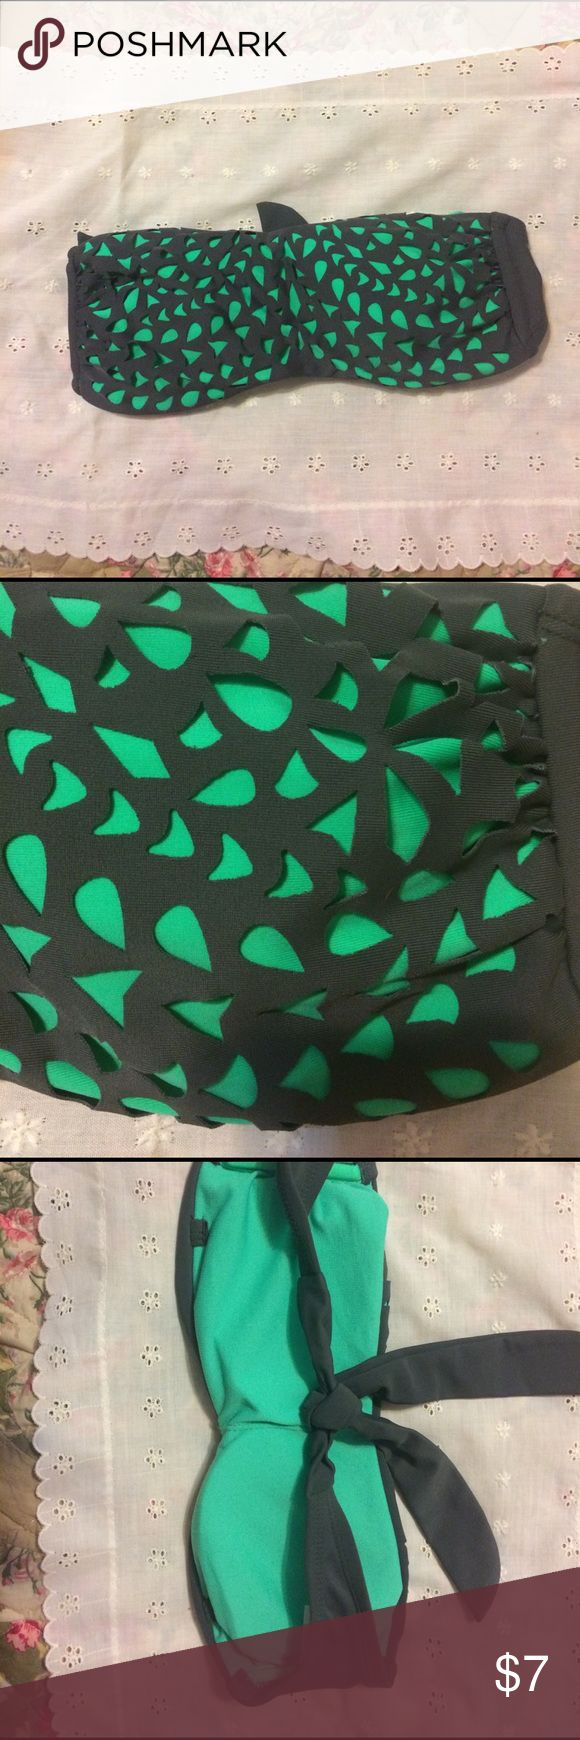 Bandeau Bikini Top Women's Size XS Xhilaration brand green/grey bandeau bikini top. Tie back, Women's Size extra small. Xhilaration Swim Bikinis